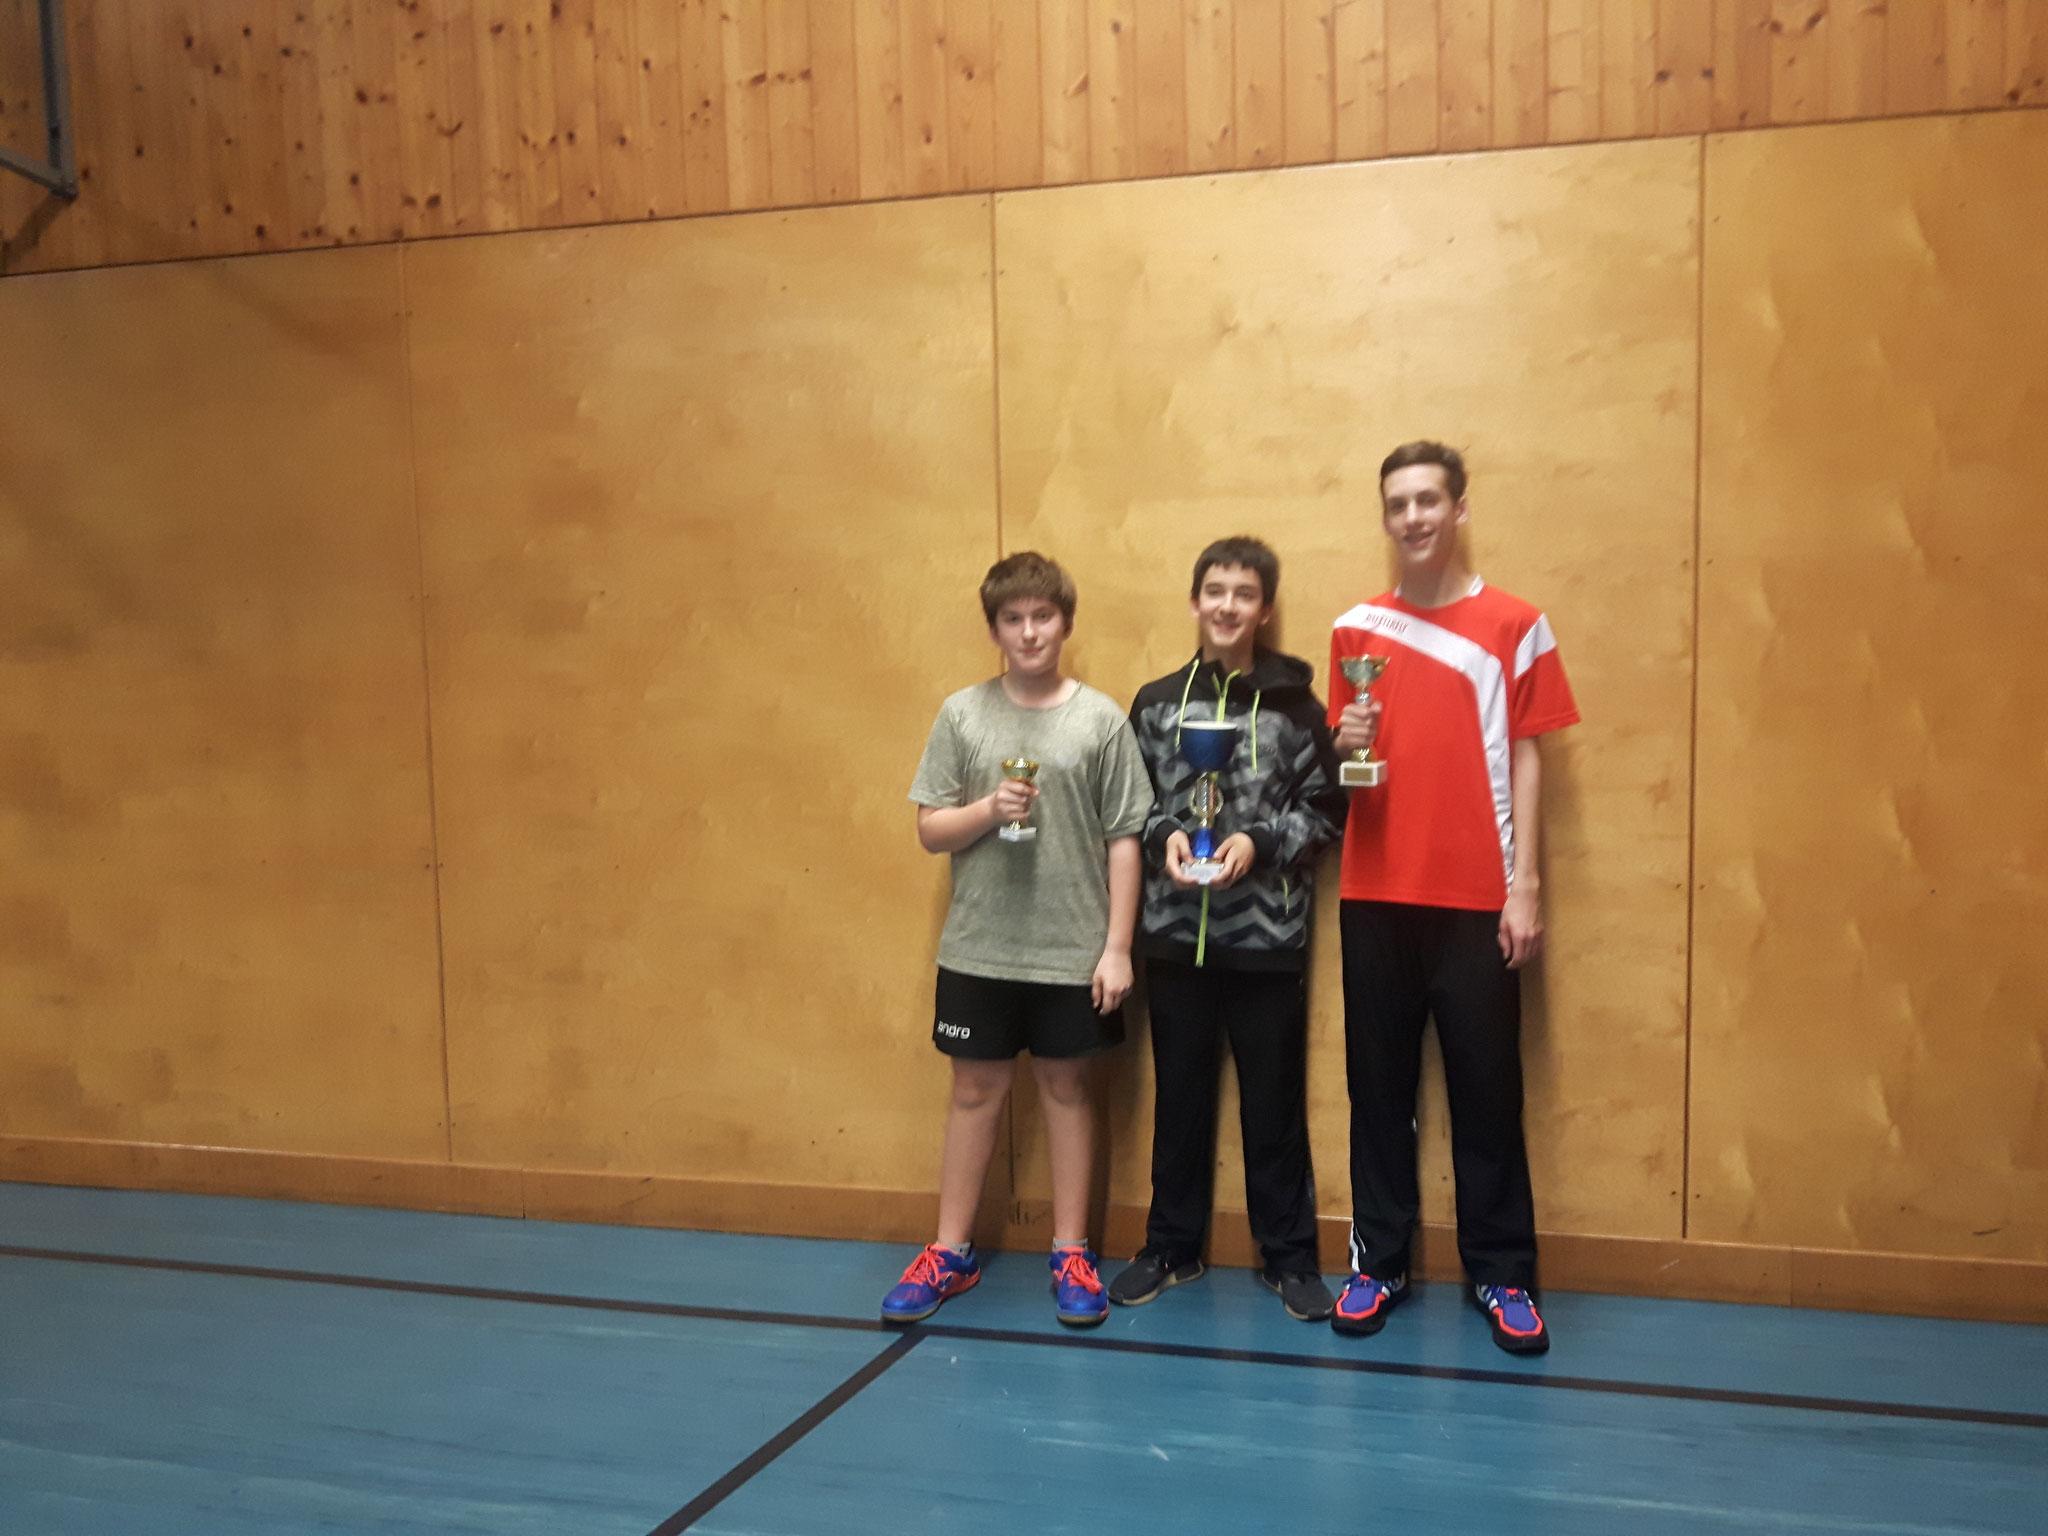 Siegerfoto Bewerb D: v.l.n.r. Florian Damm (SSTO) (Platz 3), Niklas Damm (SSTO) (Sieger), Fabian Kriha (SSTO) (Platz 2)